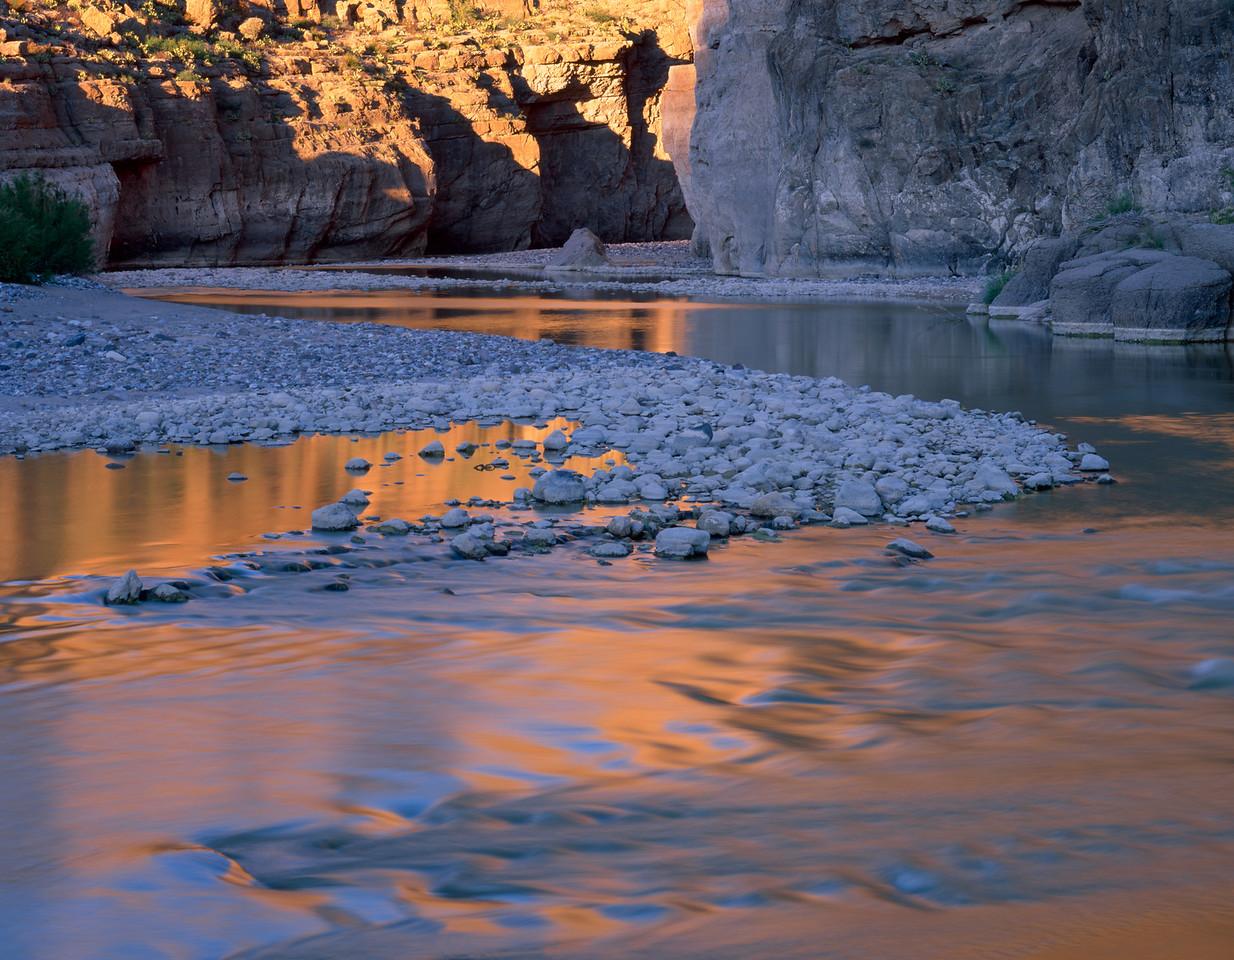 Canyon Santa Elena, Chihuahua, Mex /  Sunset on cliffs reflected in the Rio Grande River at canyon's mouth. Canyon of Santa Elena Flora & Fauna Protection Area.305H5